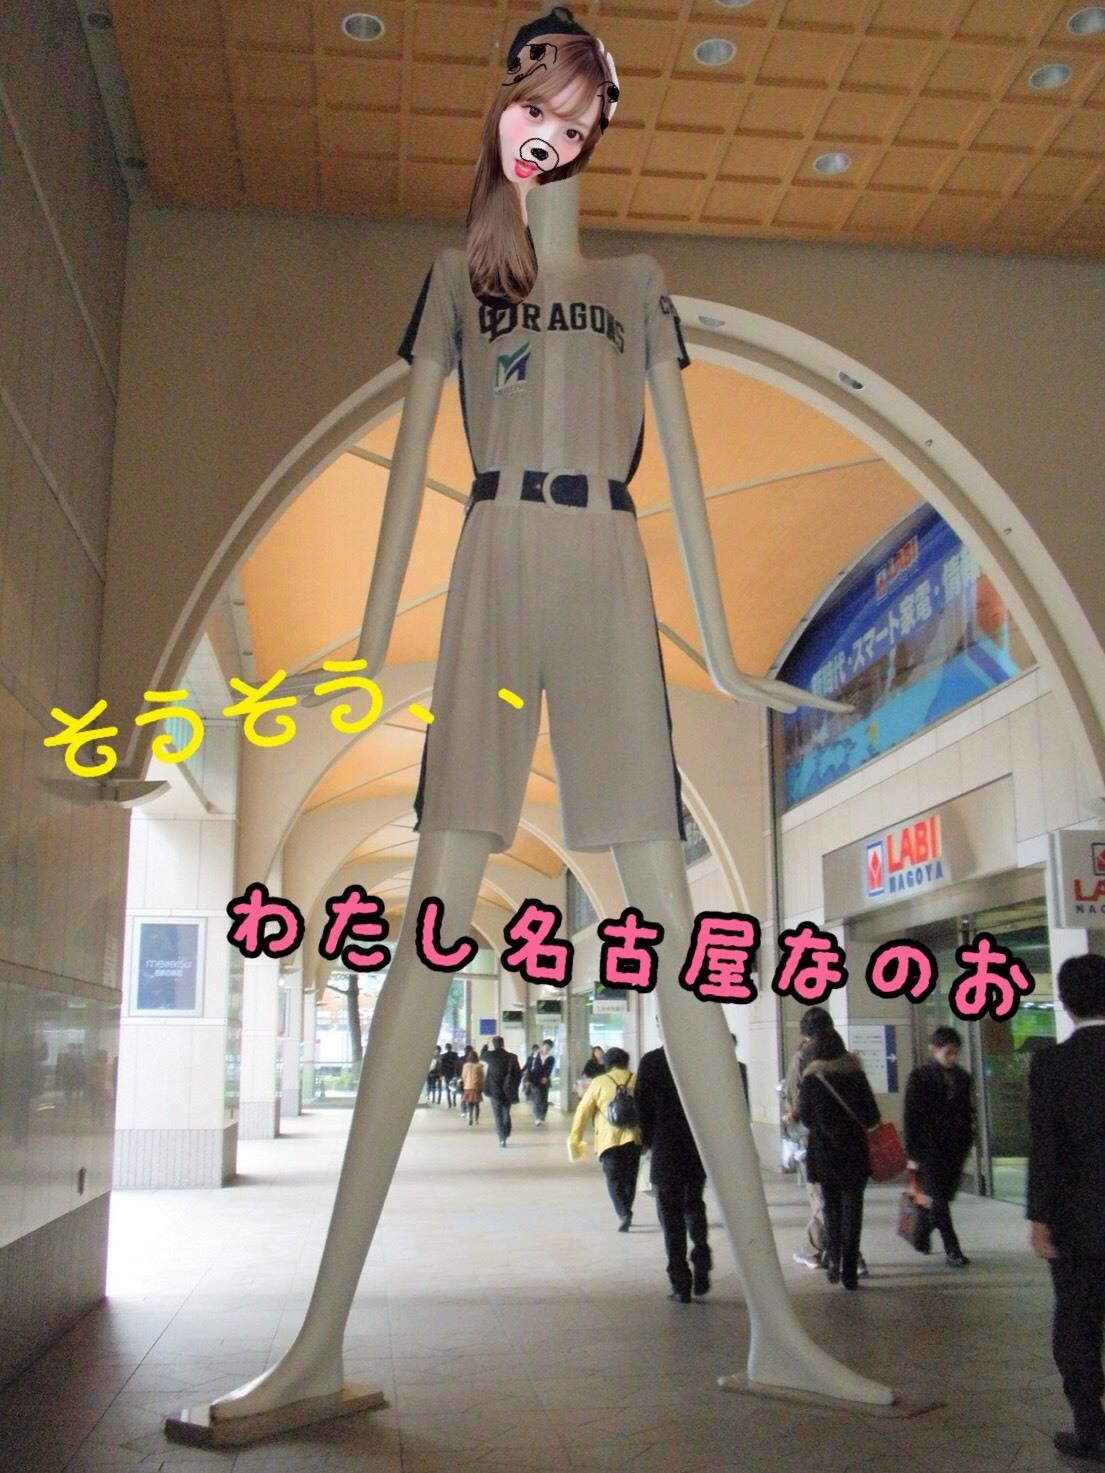 S__13828123.jpg